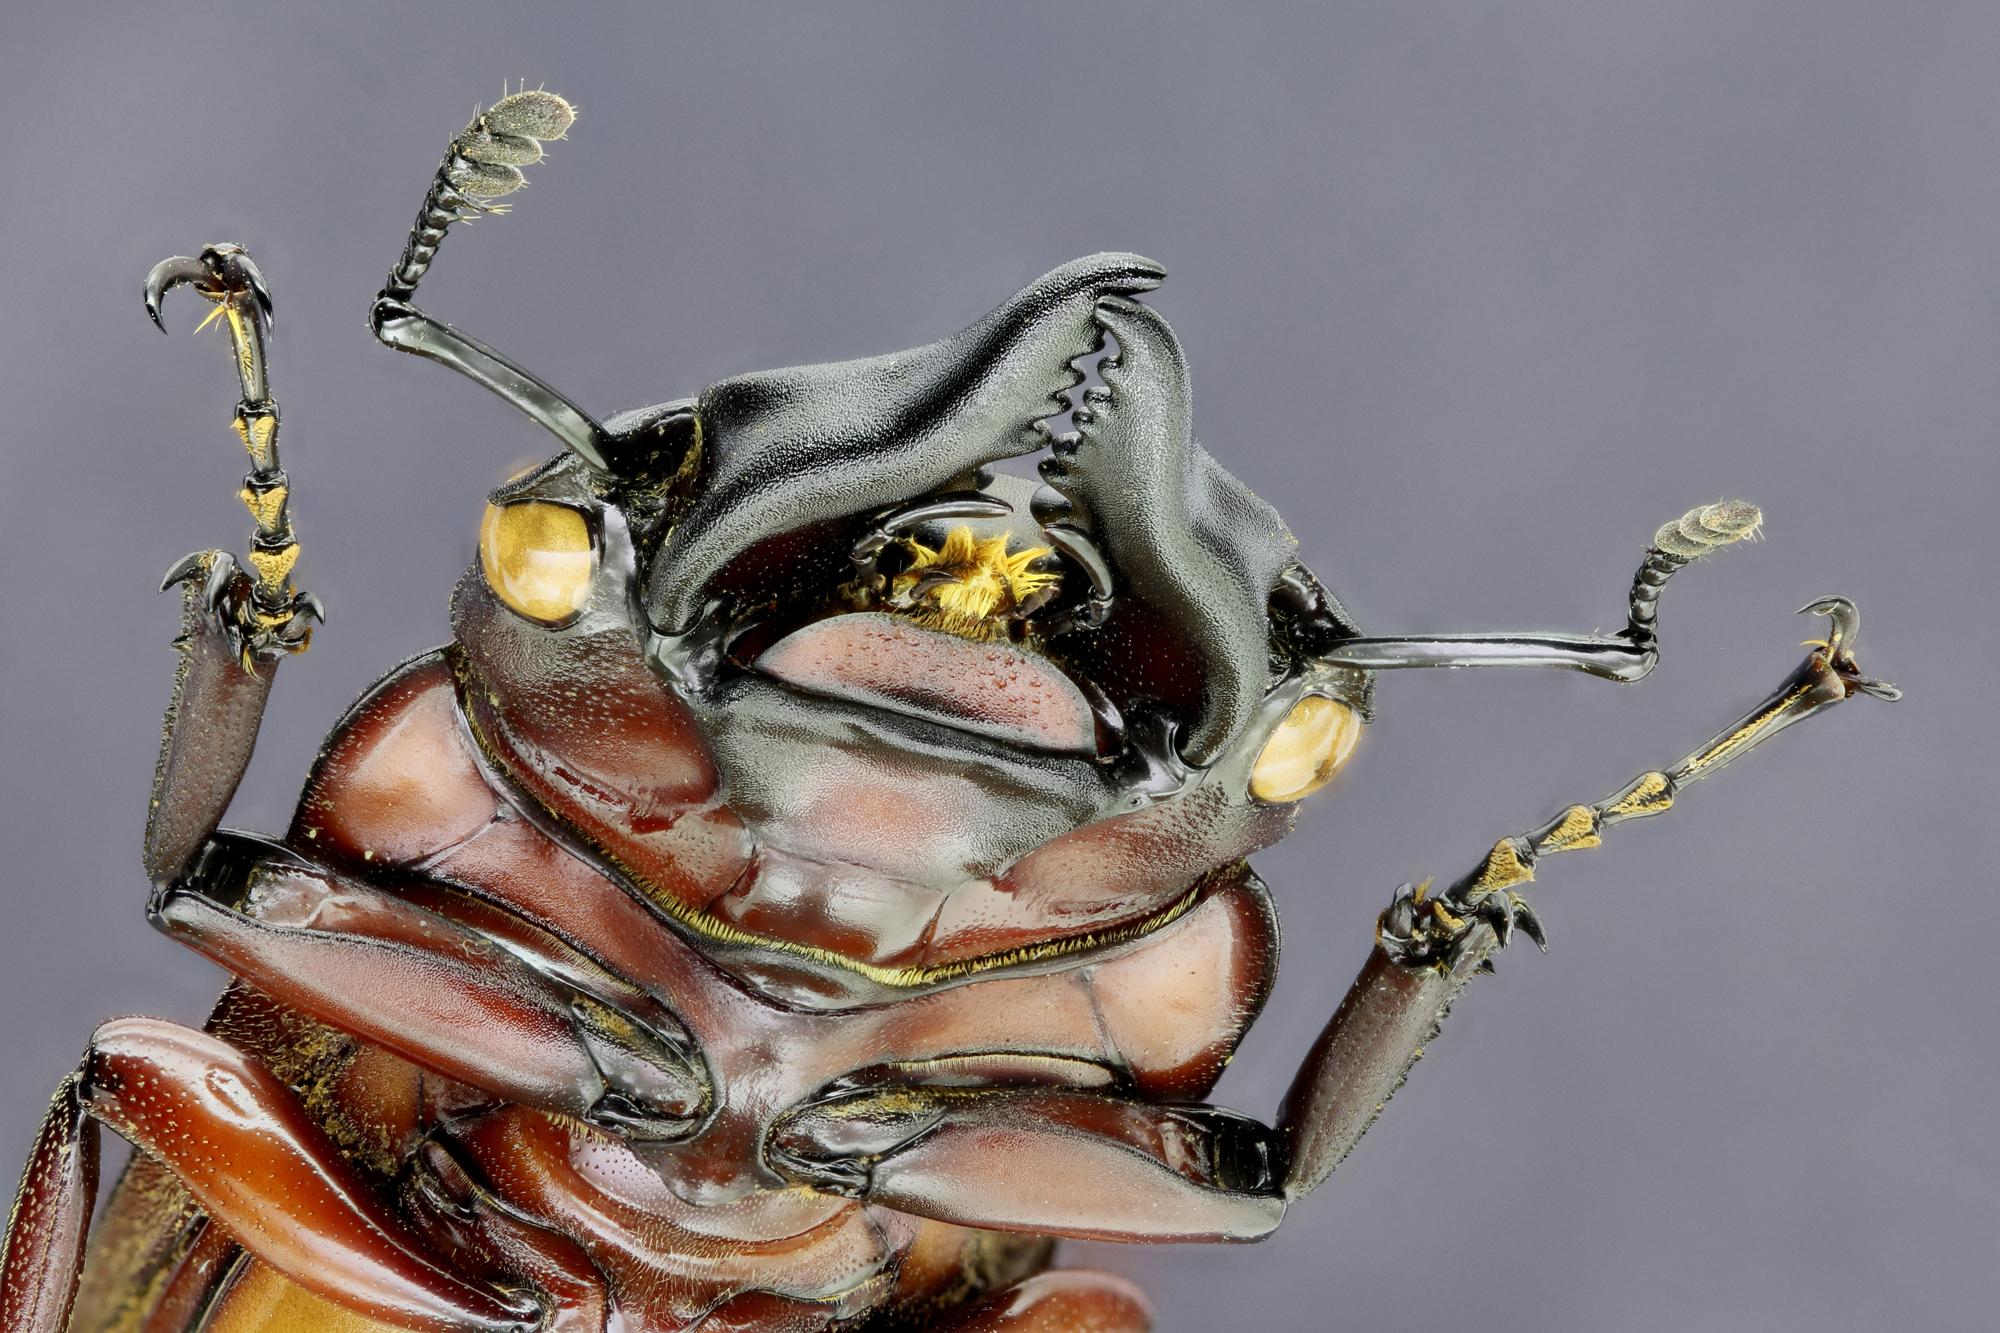 Prosopocoilus antilope 30324zs52.jpg